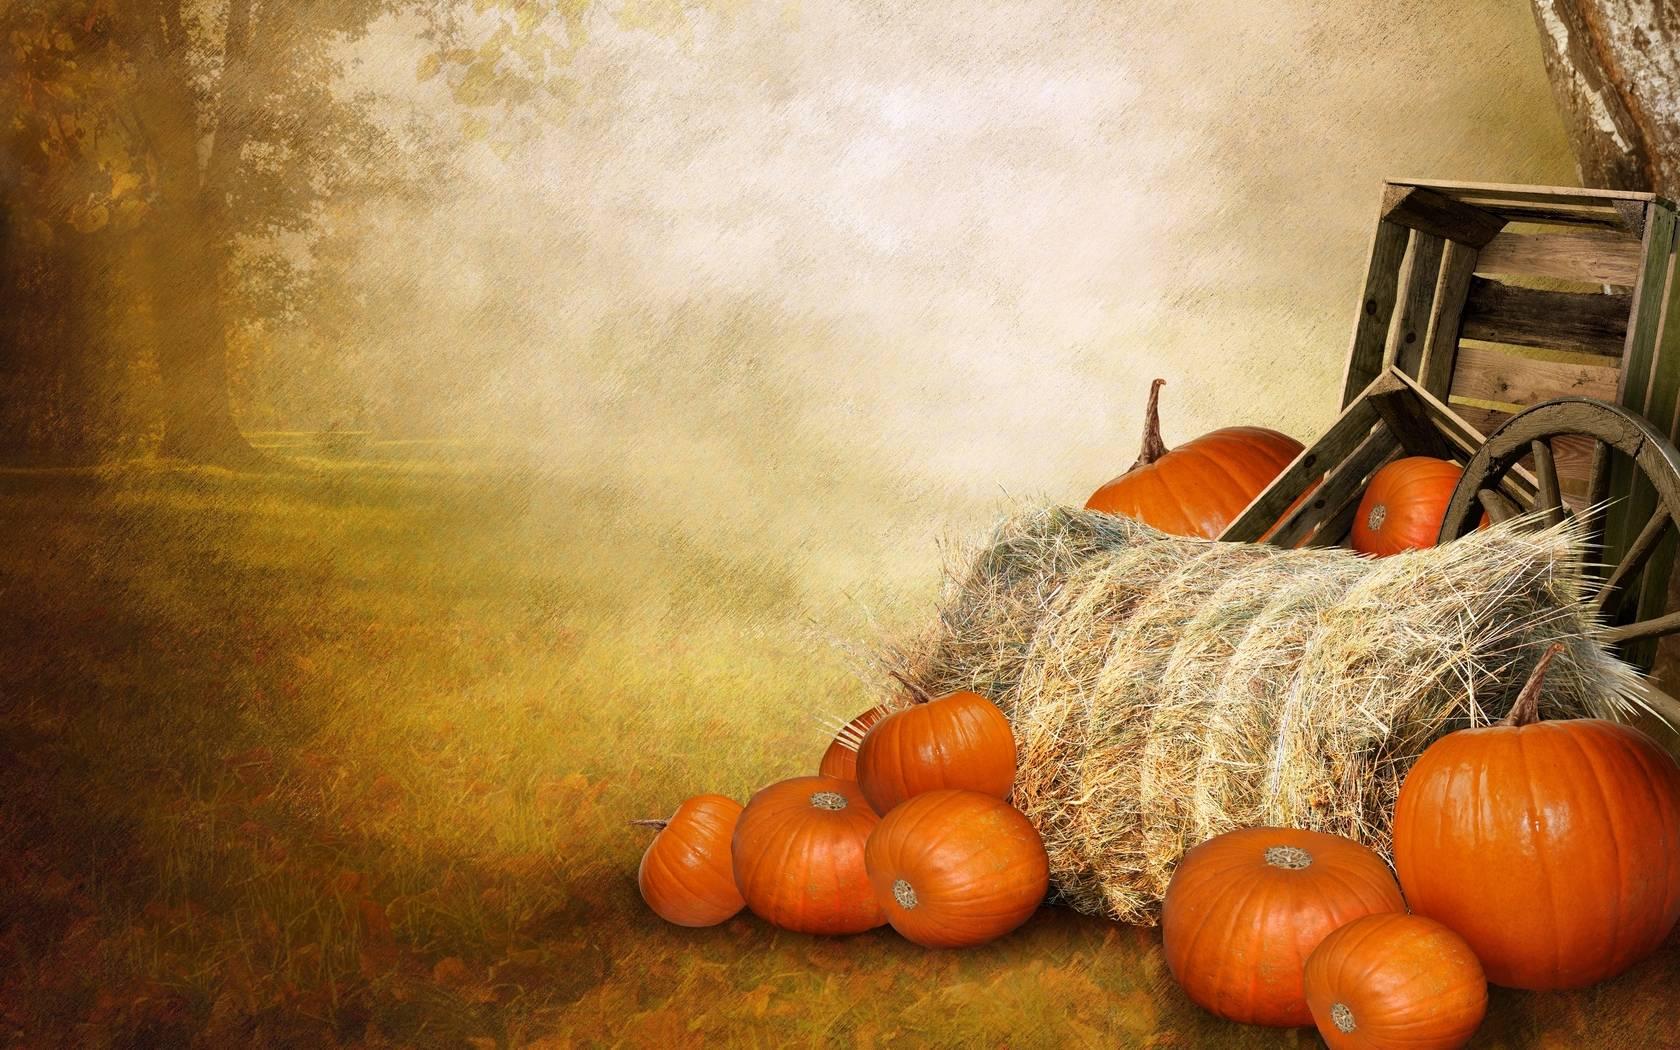 Pumpkin Wallpapers Free - Wallpaper Cave